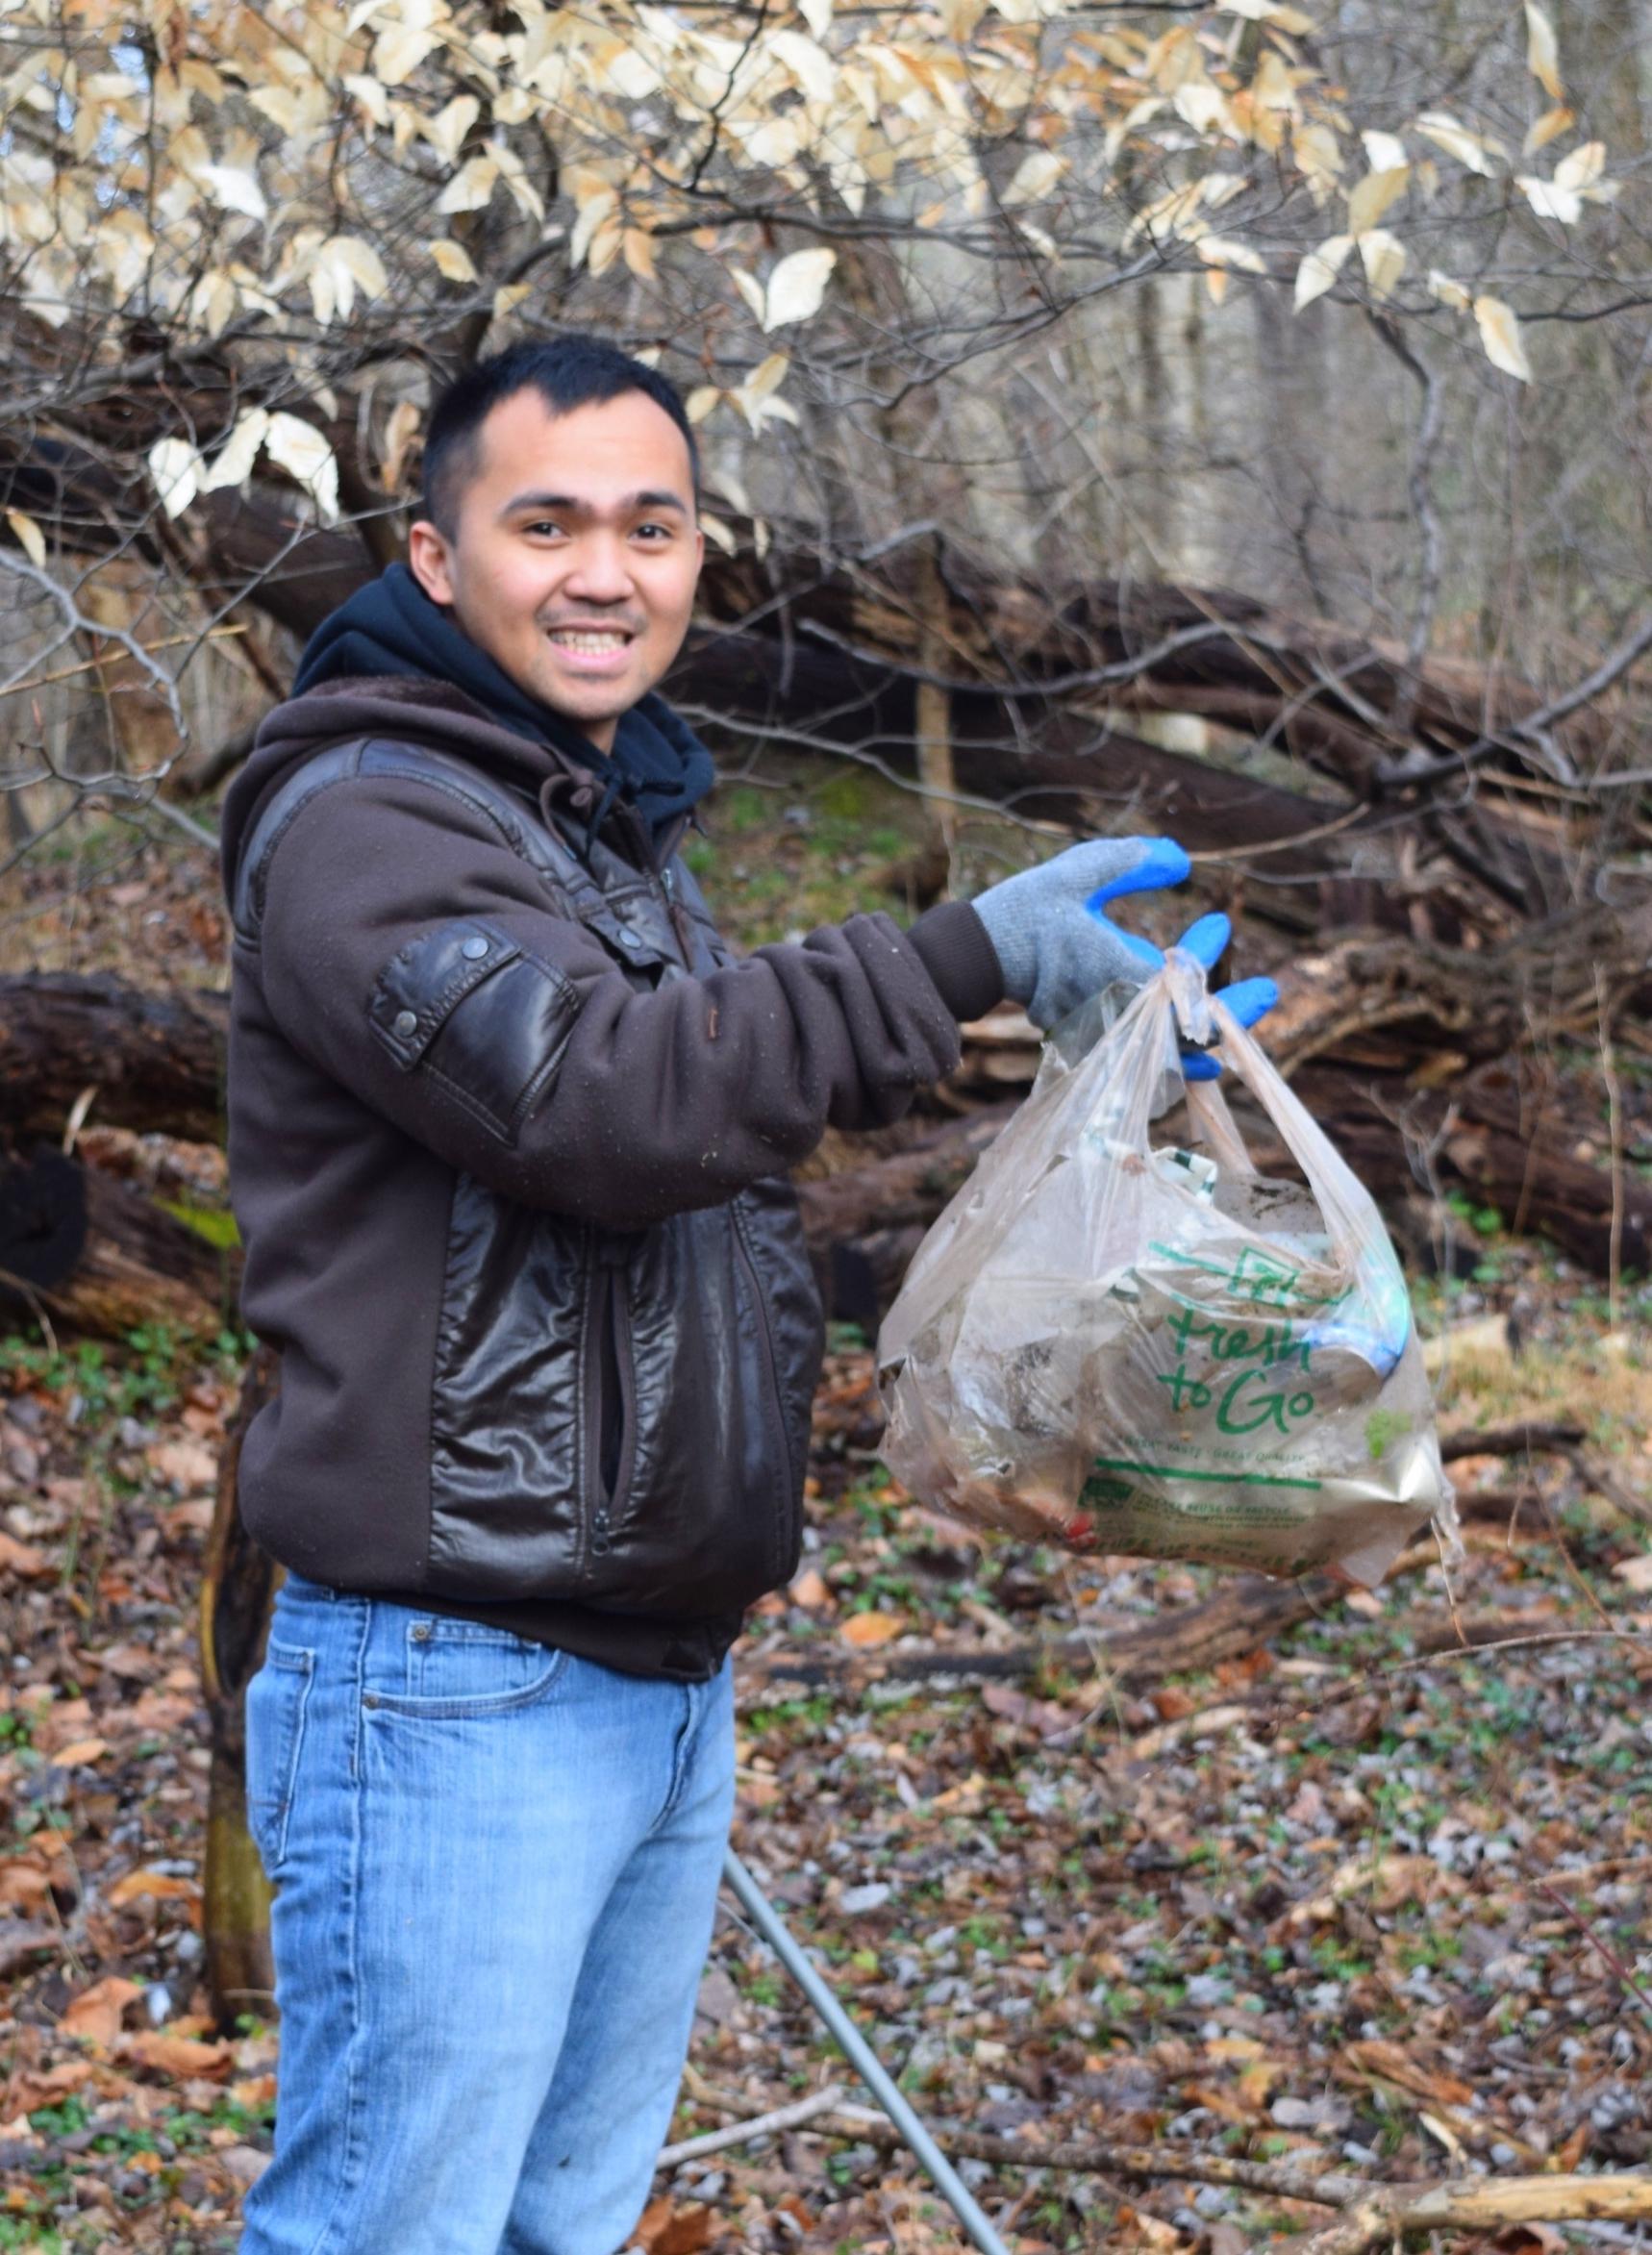 potomac river volunteer